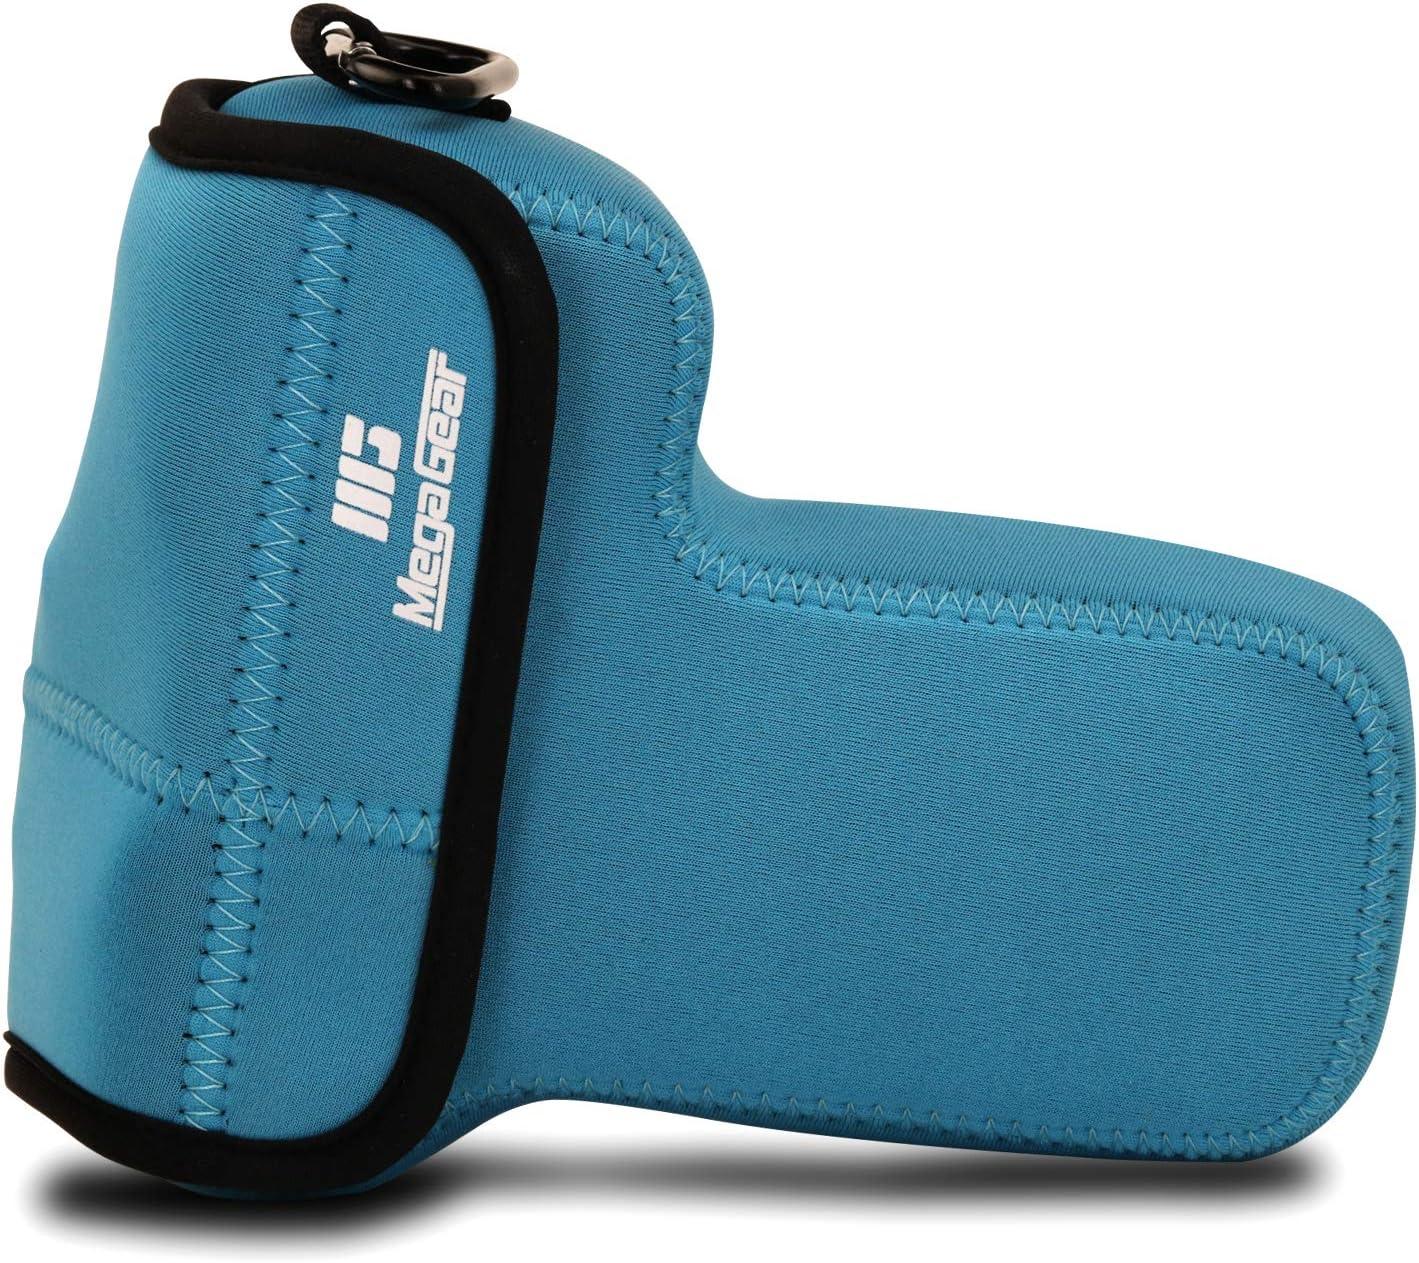 Megagear Mg1823 Ultraleichte Neopren Kameratasche Kompatibel Mit Nikon Z50 50 250 Mm Blau Elektronik